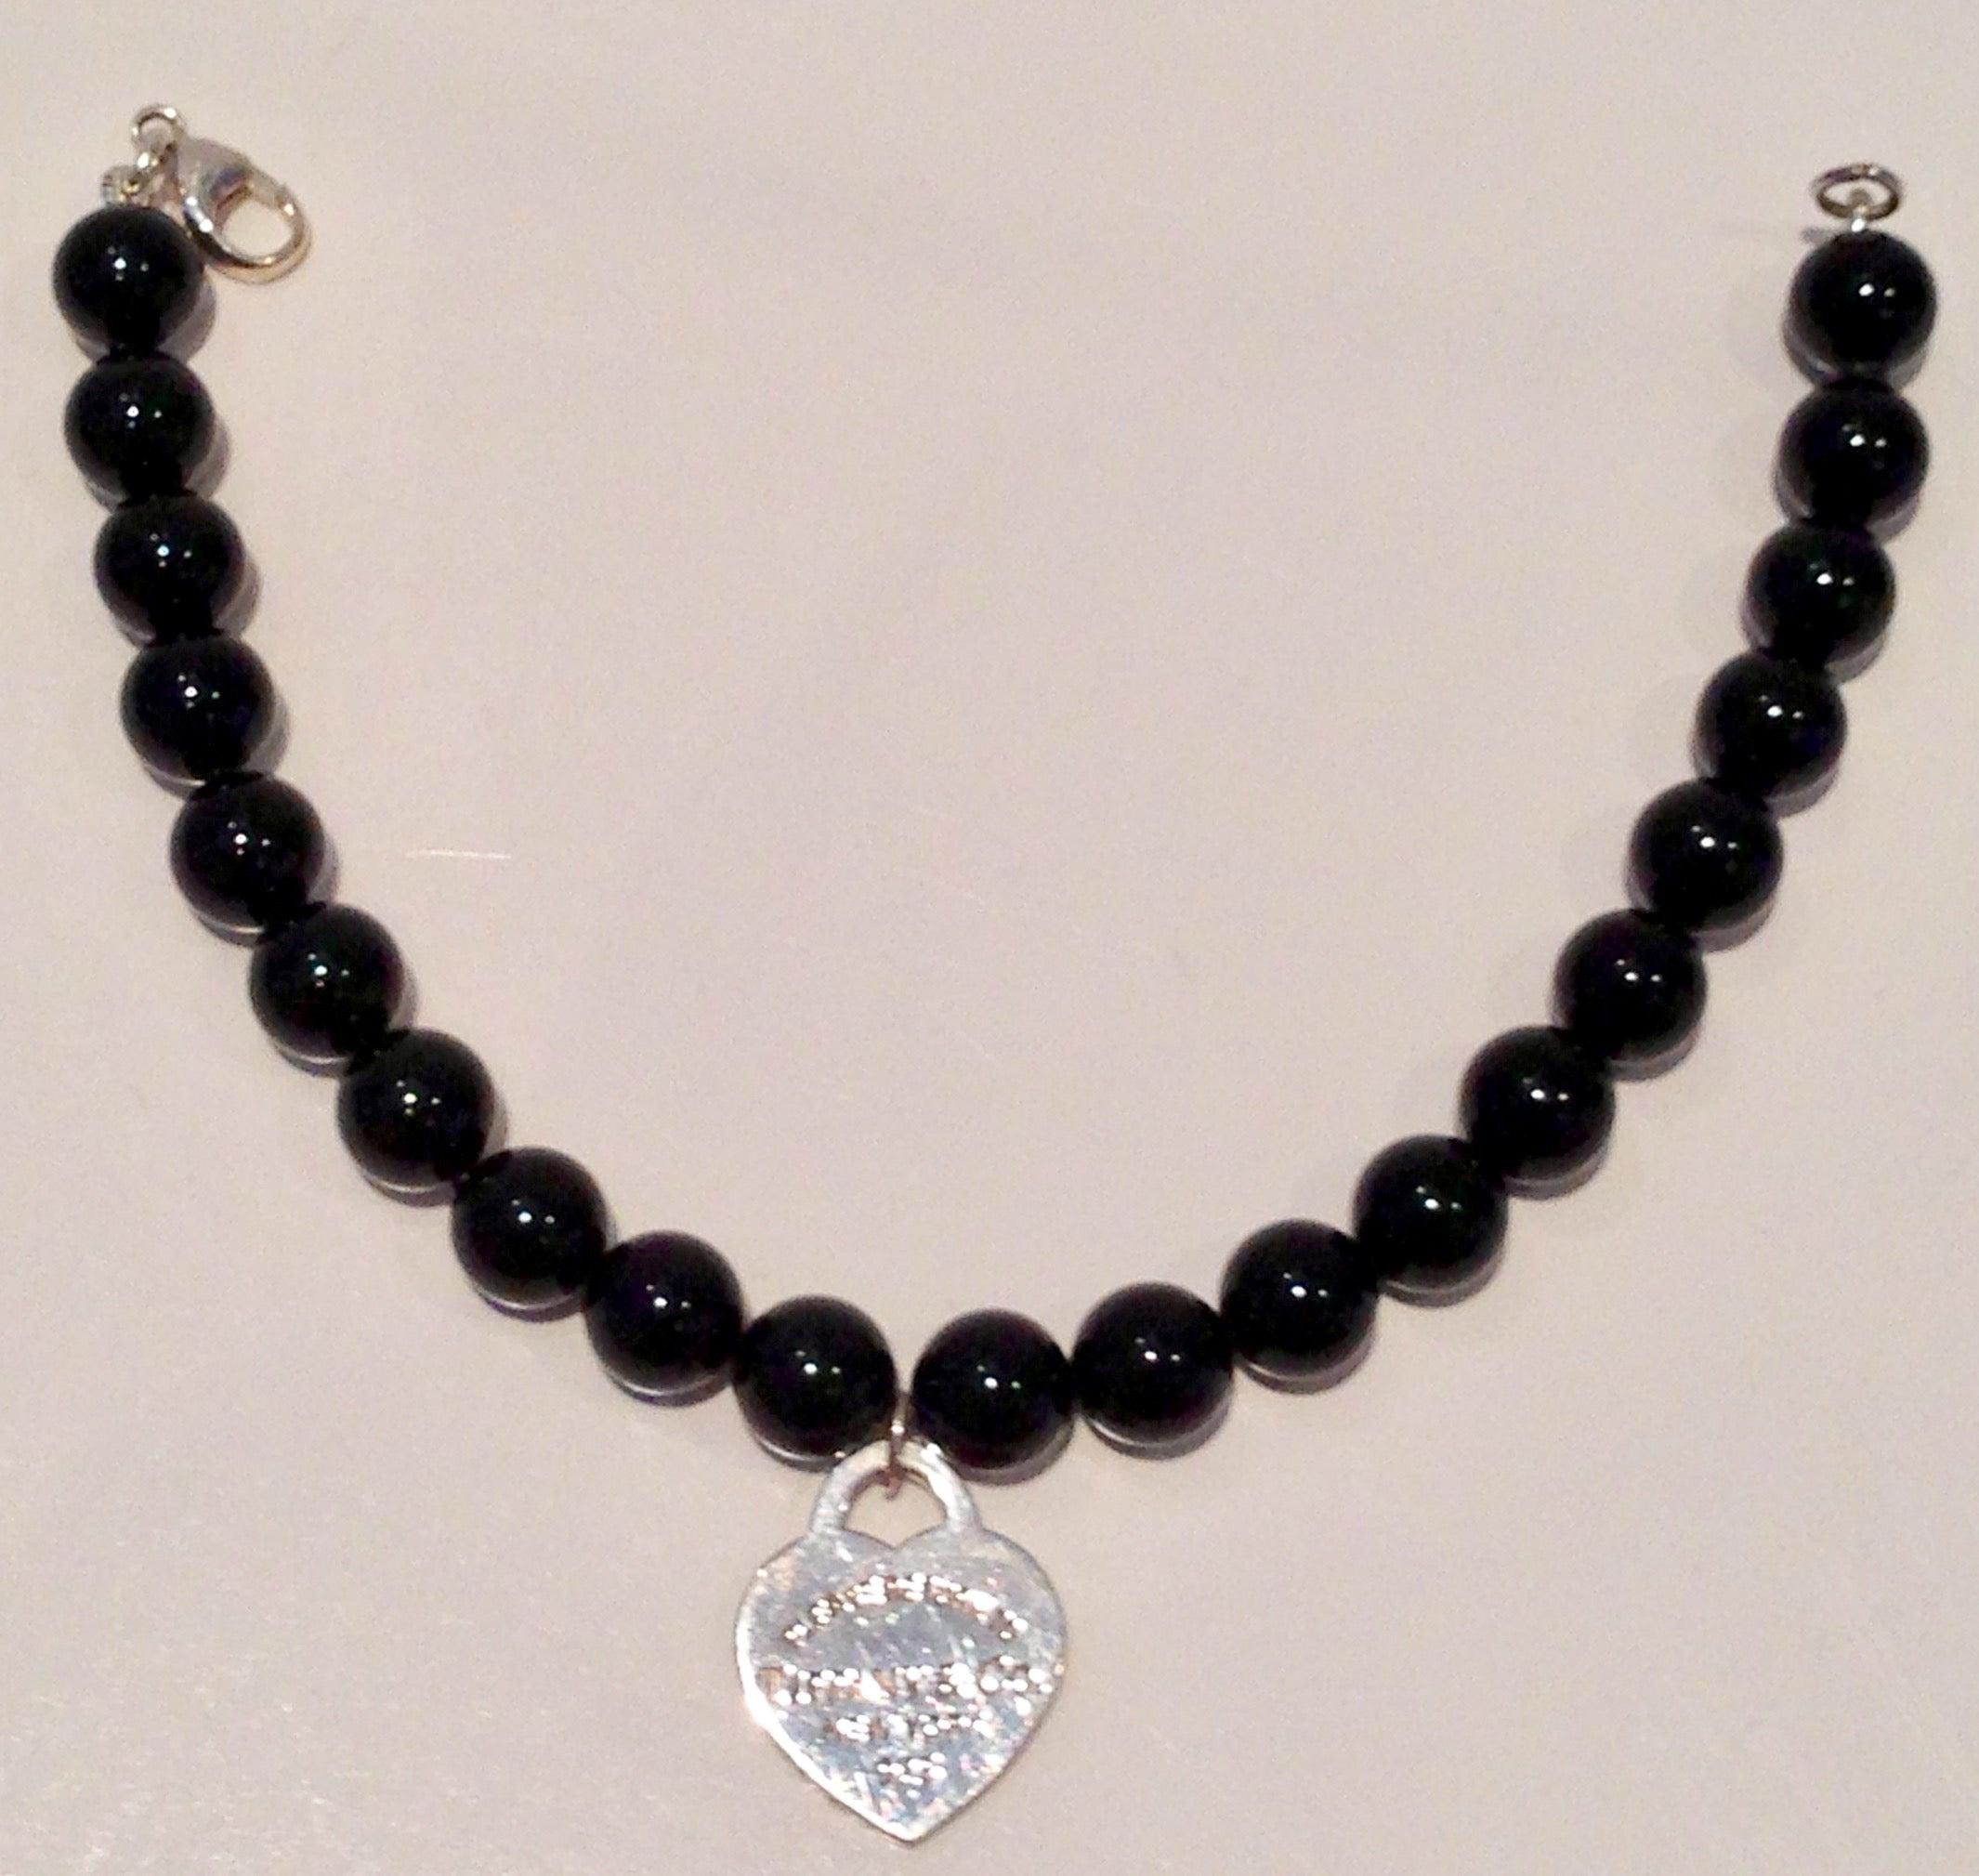 988cc33bb014 Tiffany and Co. Silver Heart Tag 7.5  Black Onyx Bead Bracelet at 1stdibs